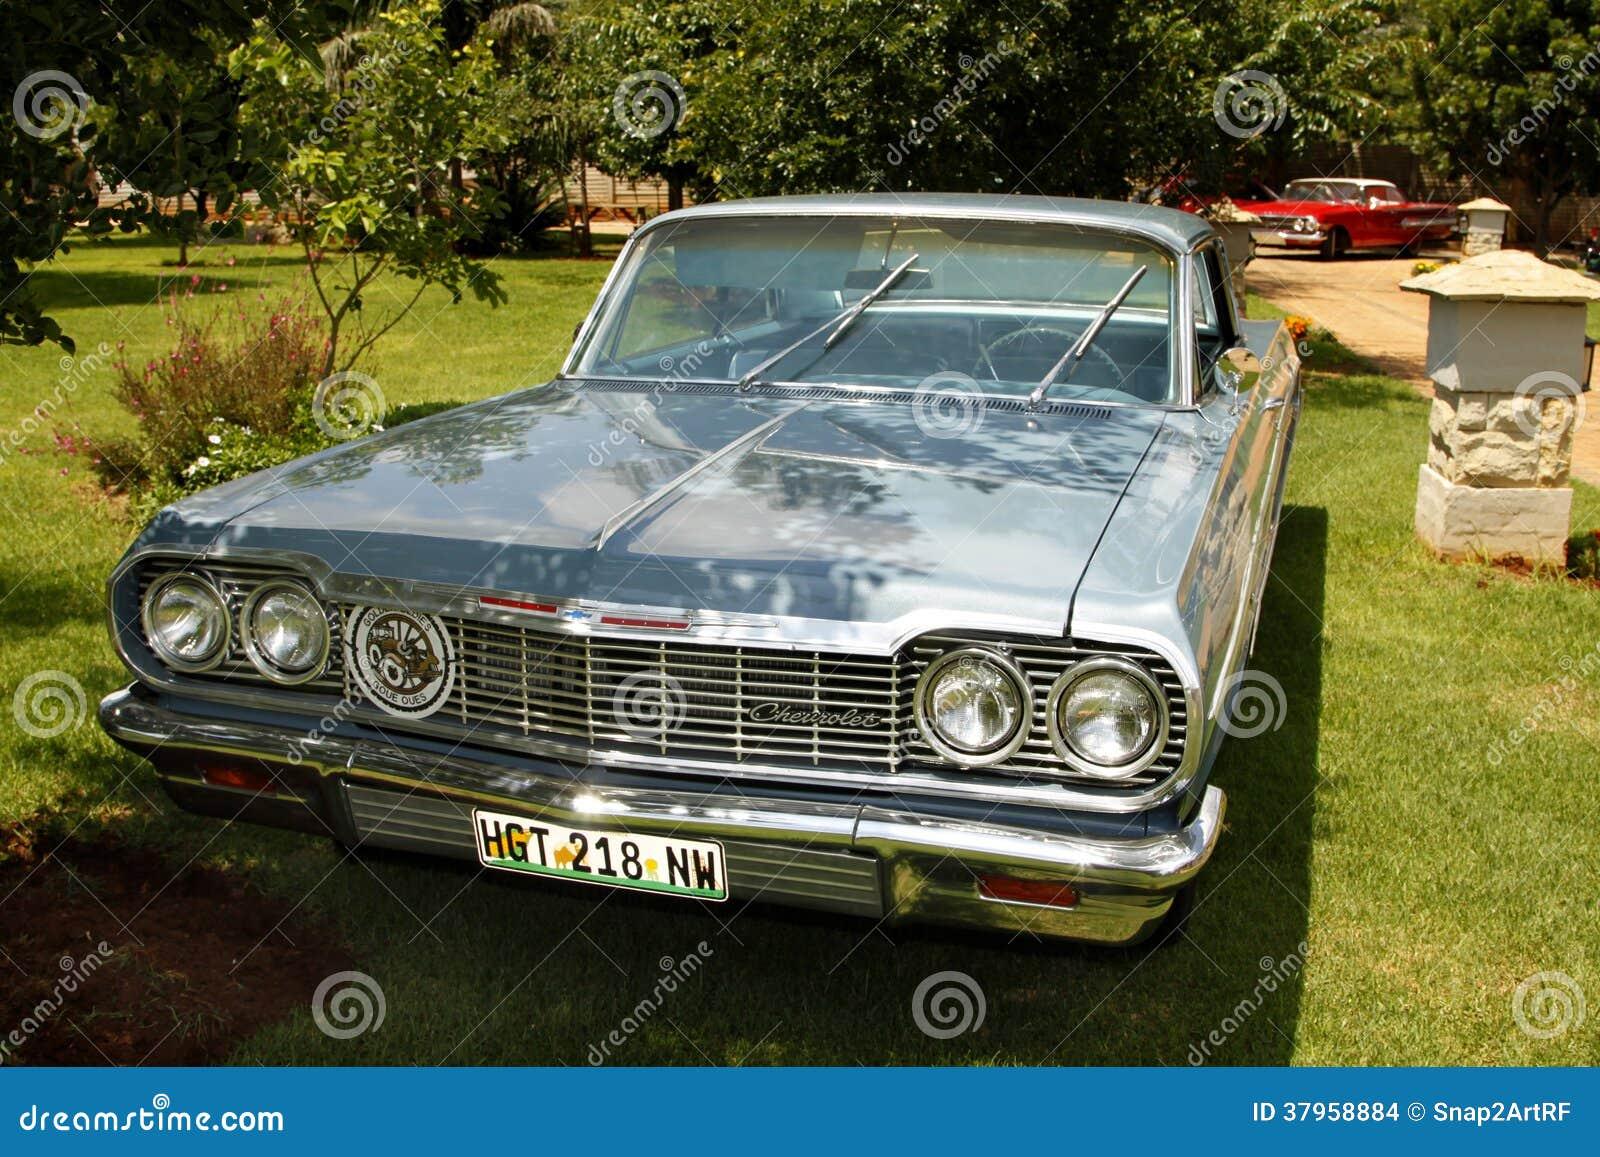 Used 2014 Chevy Impala >> Vintage Car 1964 Chevrolet Impala Coupe Editorial Stock Image - Image: 37958884